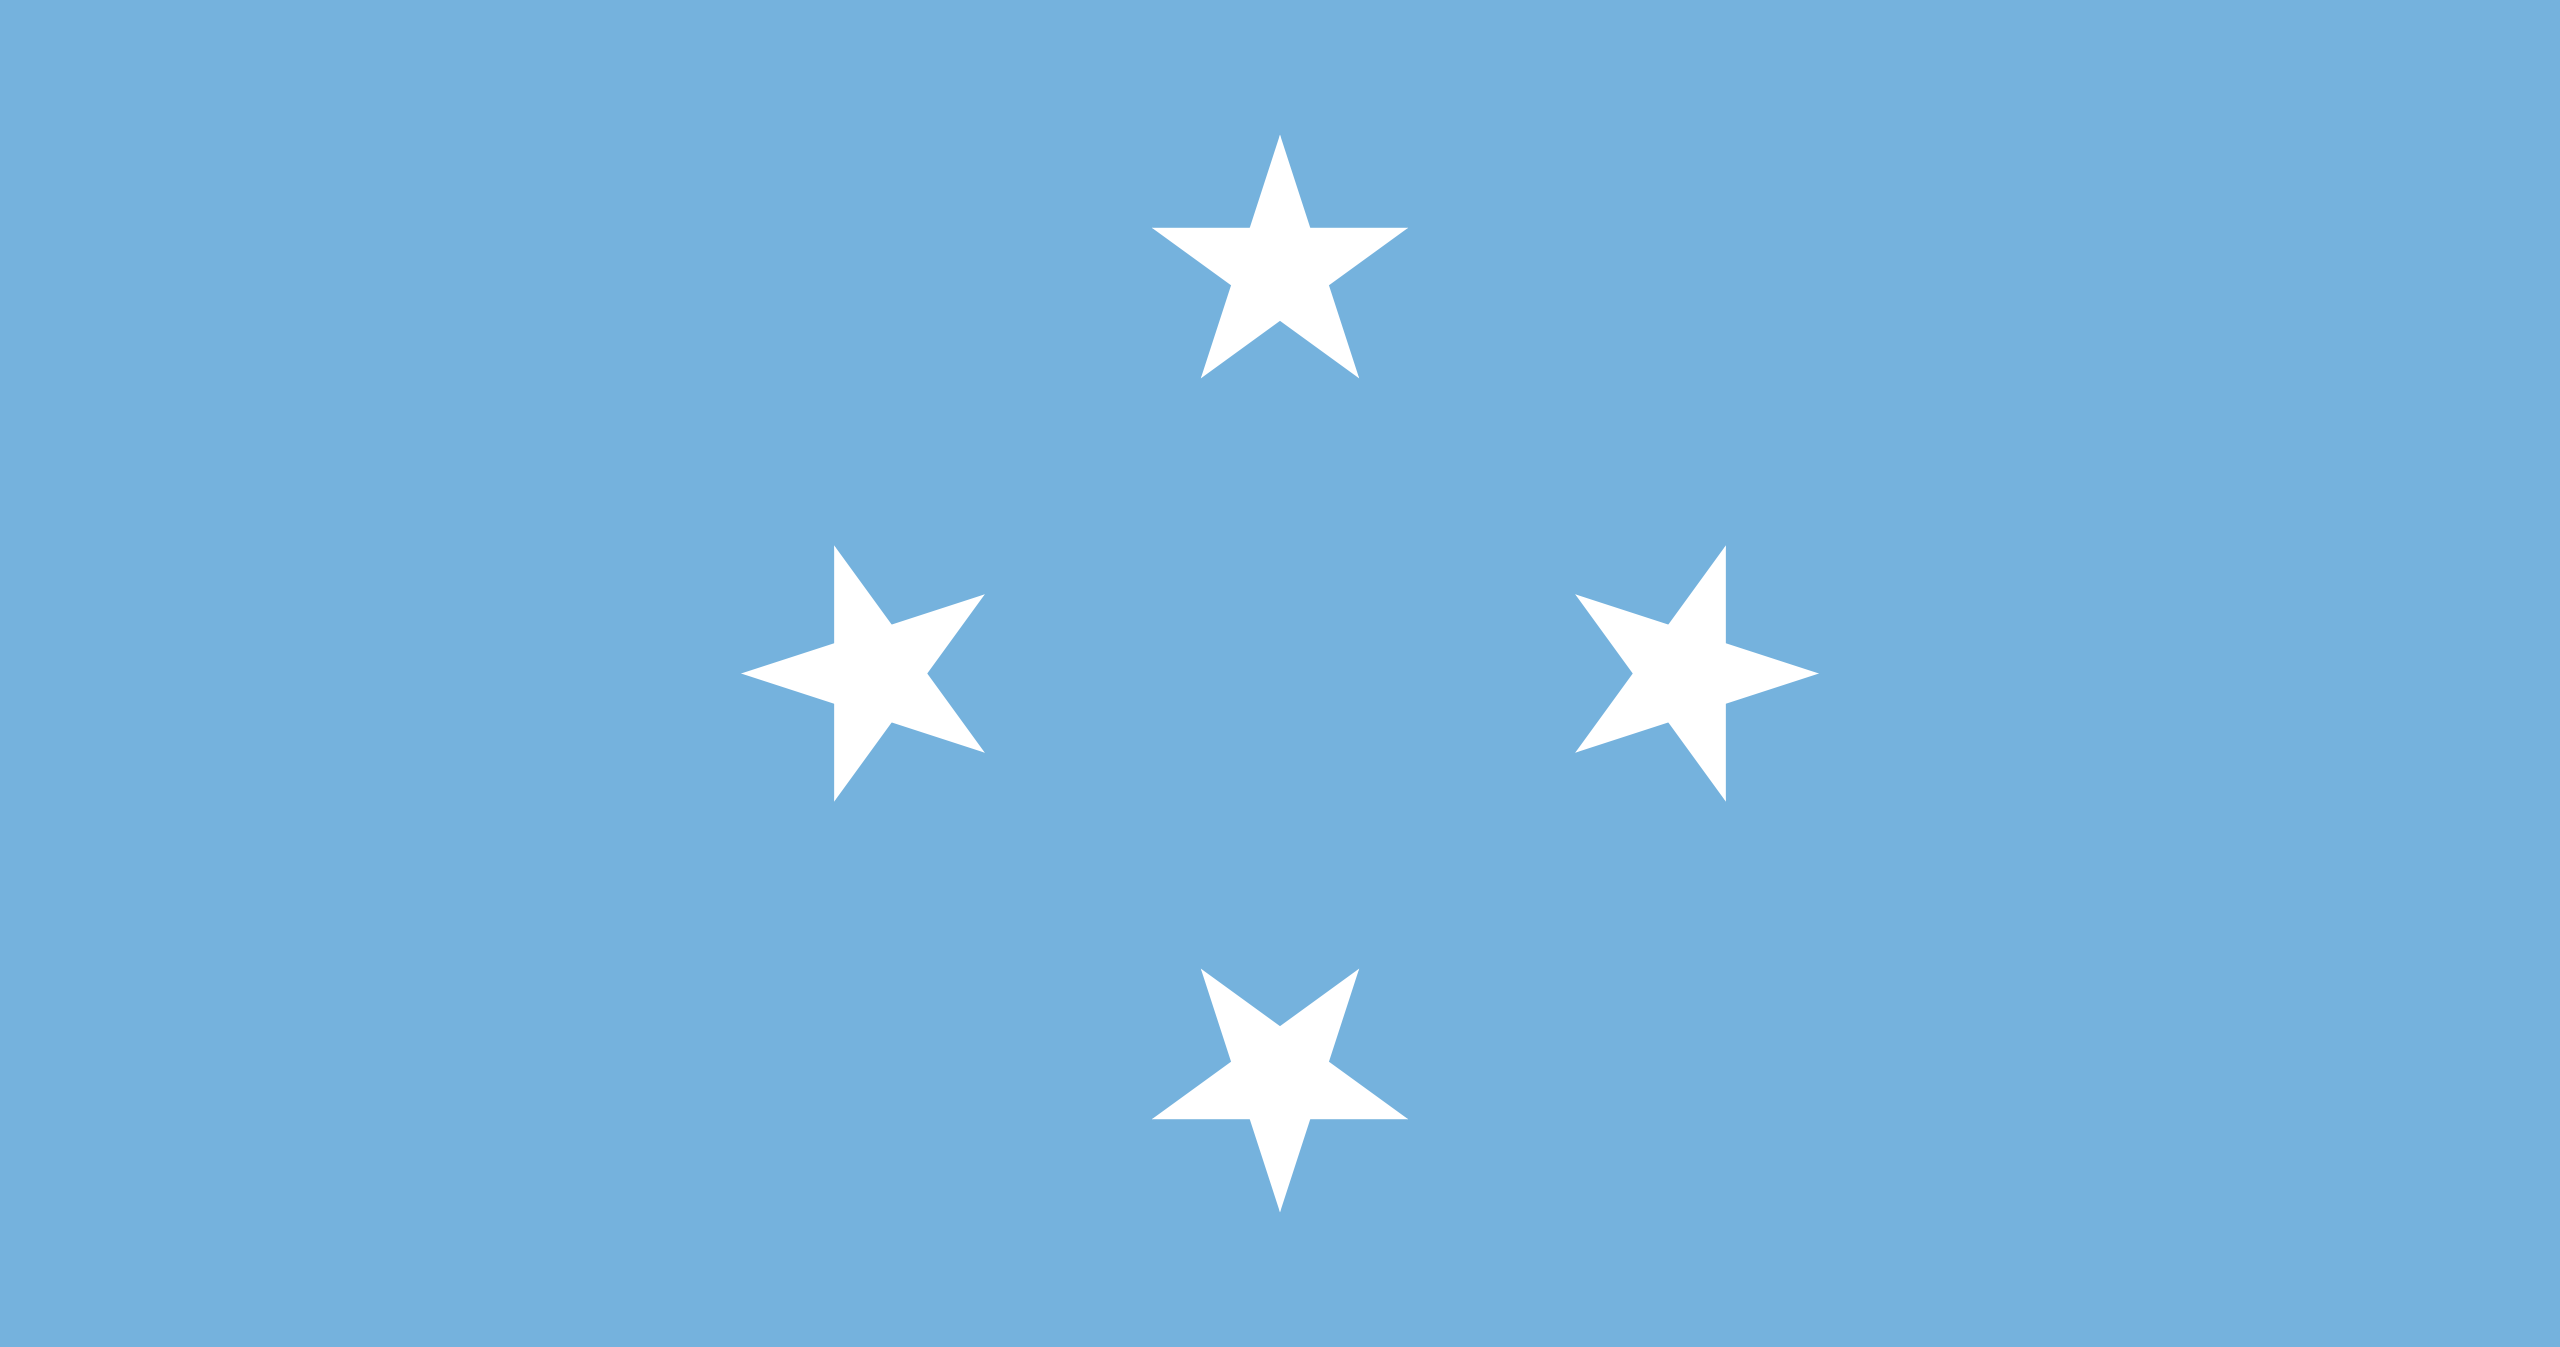 micronesia, país, emblema, insignia, símbolo - Fondos de Pantalla HD - professor-falken.com